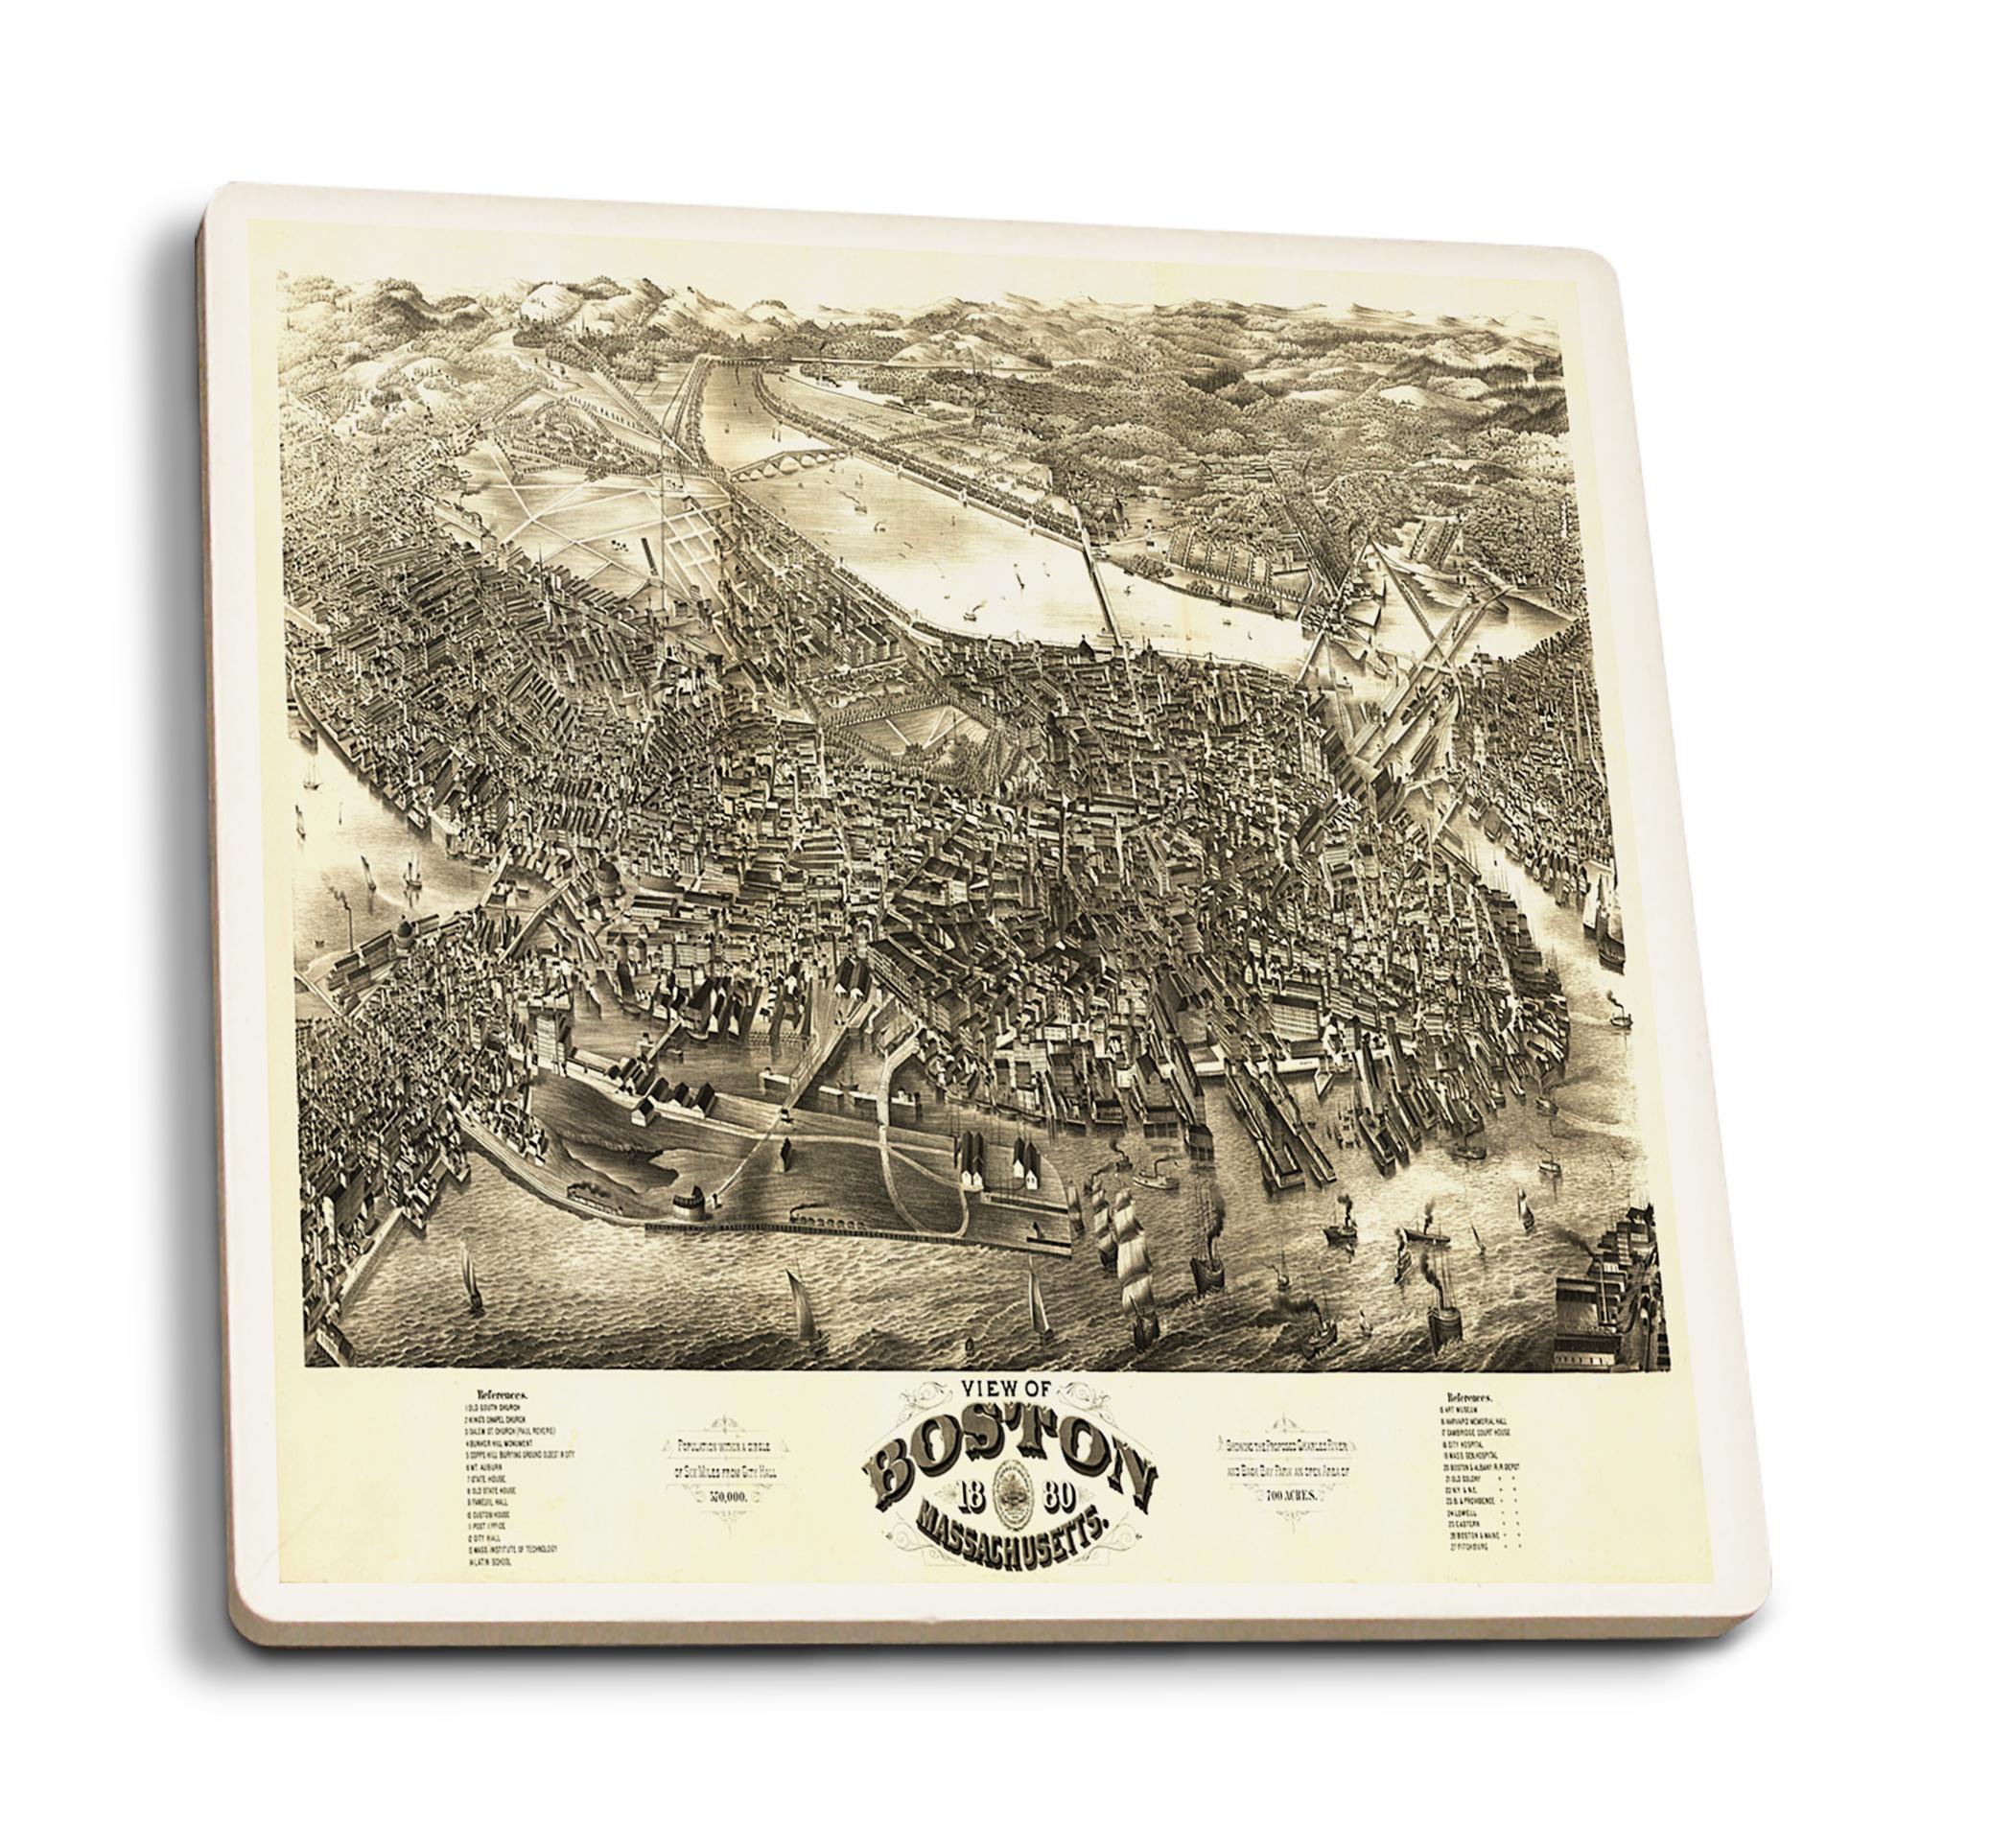 Boston, Massachusetts - (1880) - Panoramic Map (Set of 4 Ceramic Coasters - Cork-backed, Absorbent)